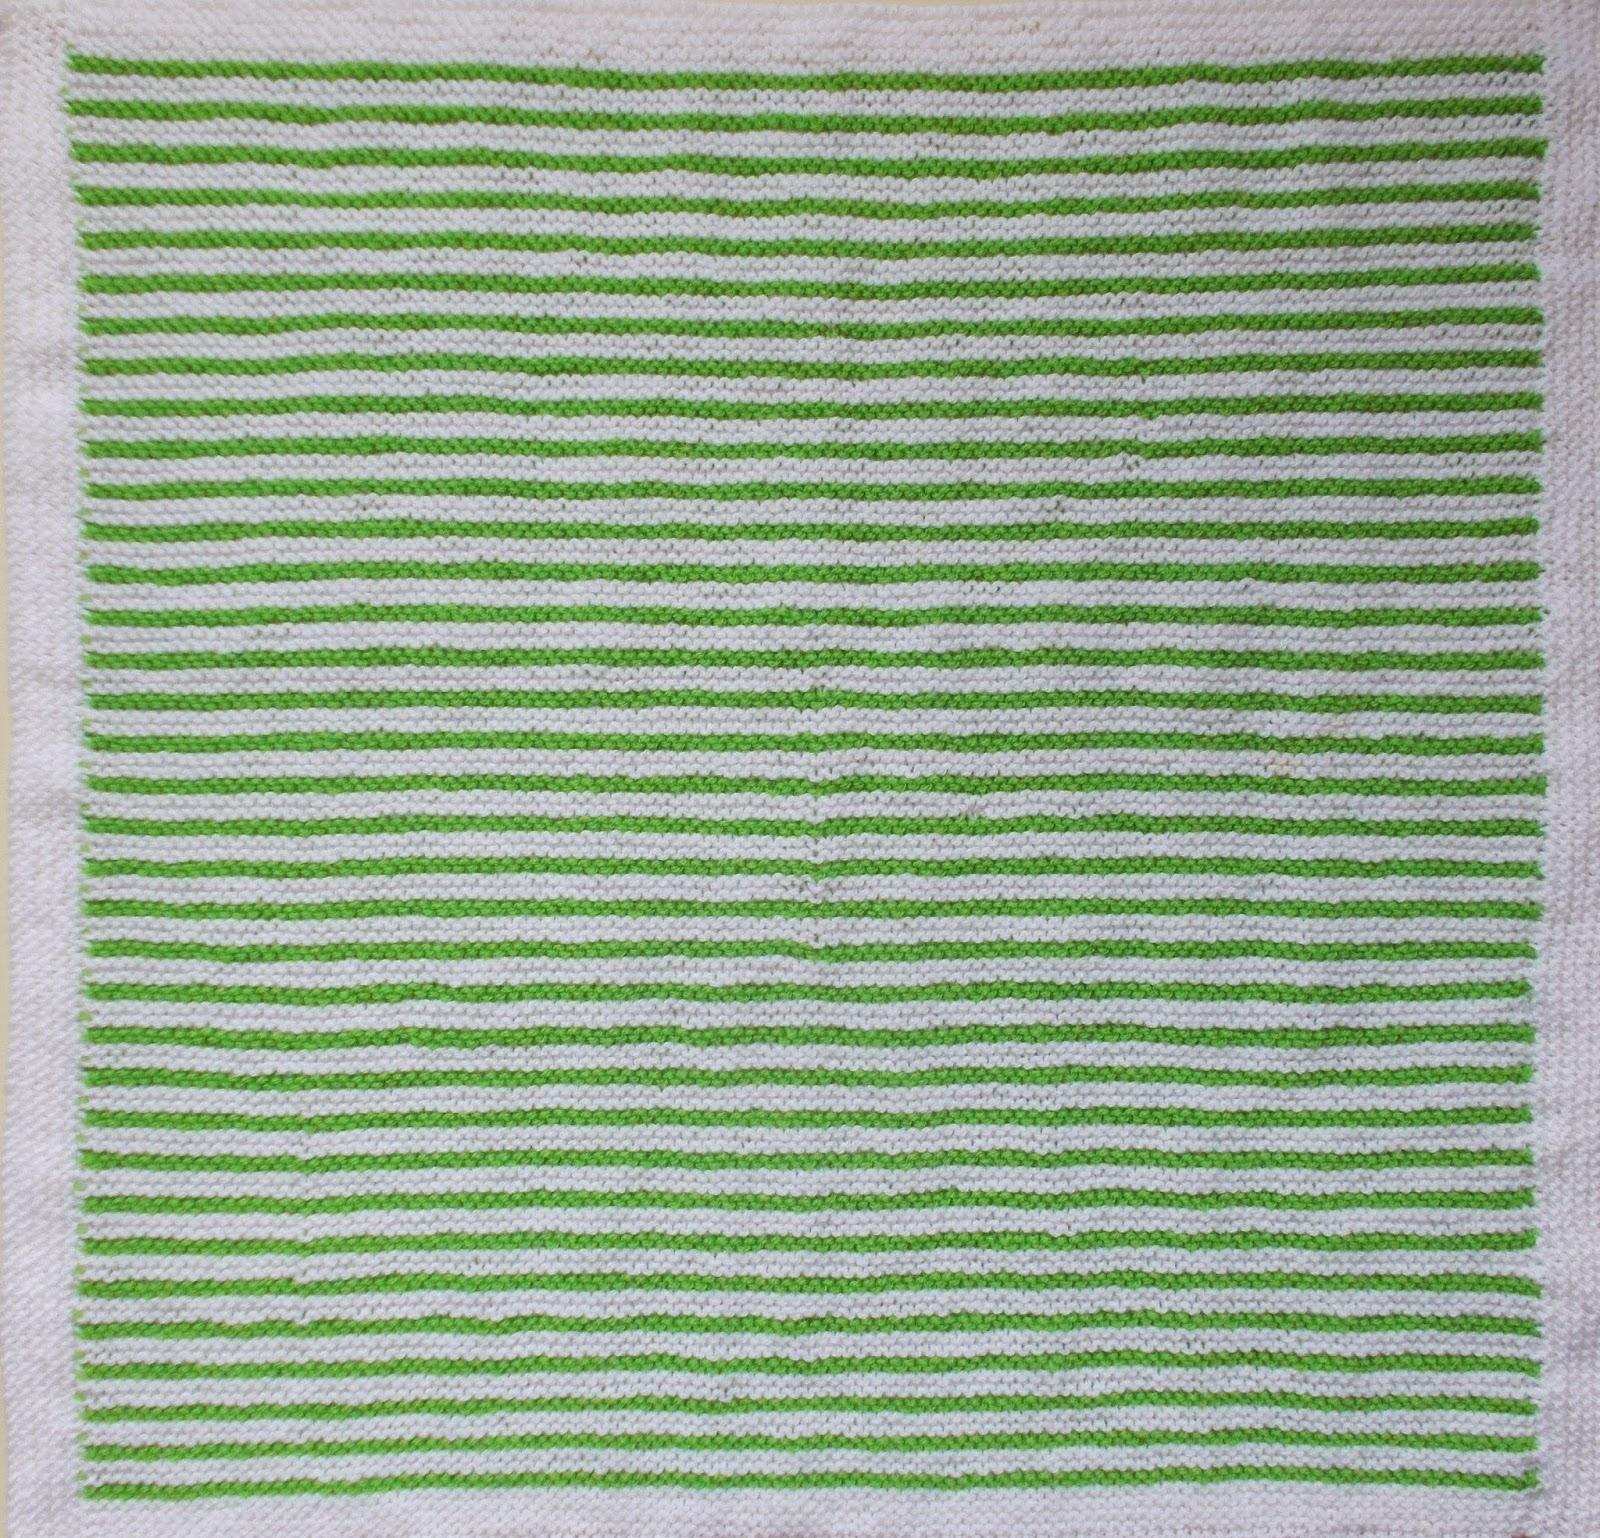 a115556dab99 Marianna s Lazy Daisy Days  Easy Garter Stitch Striped Baby Blanket